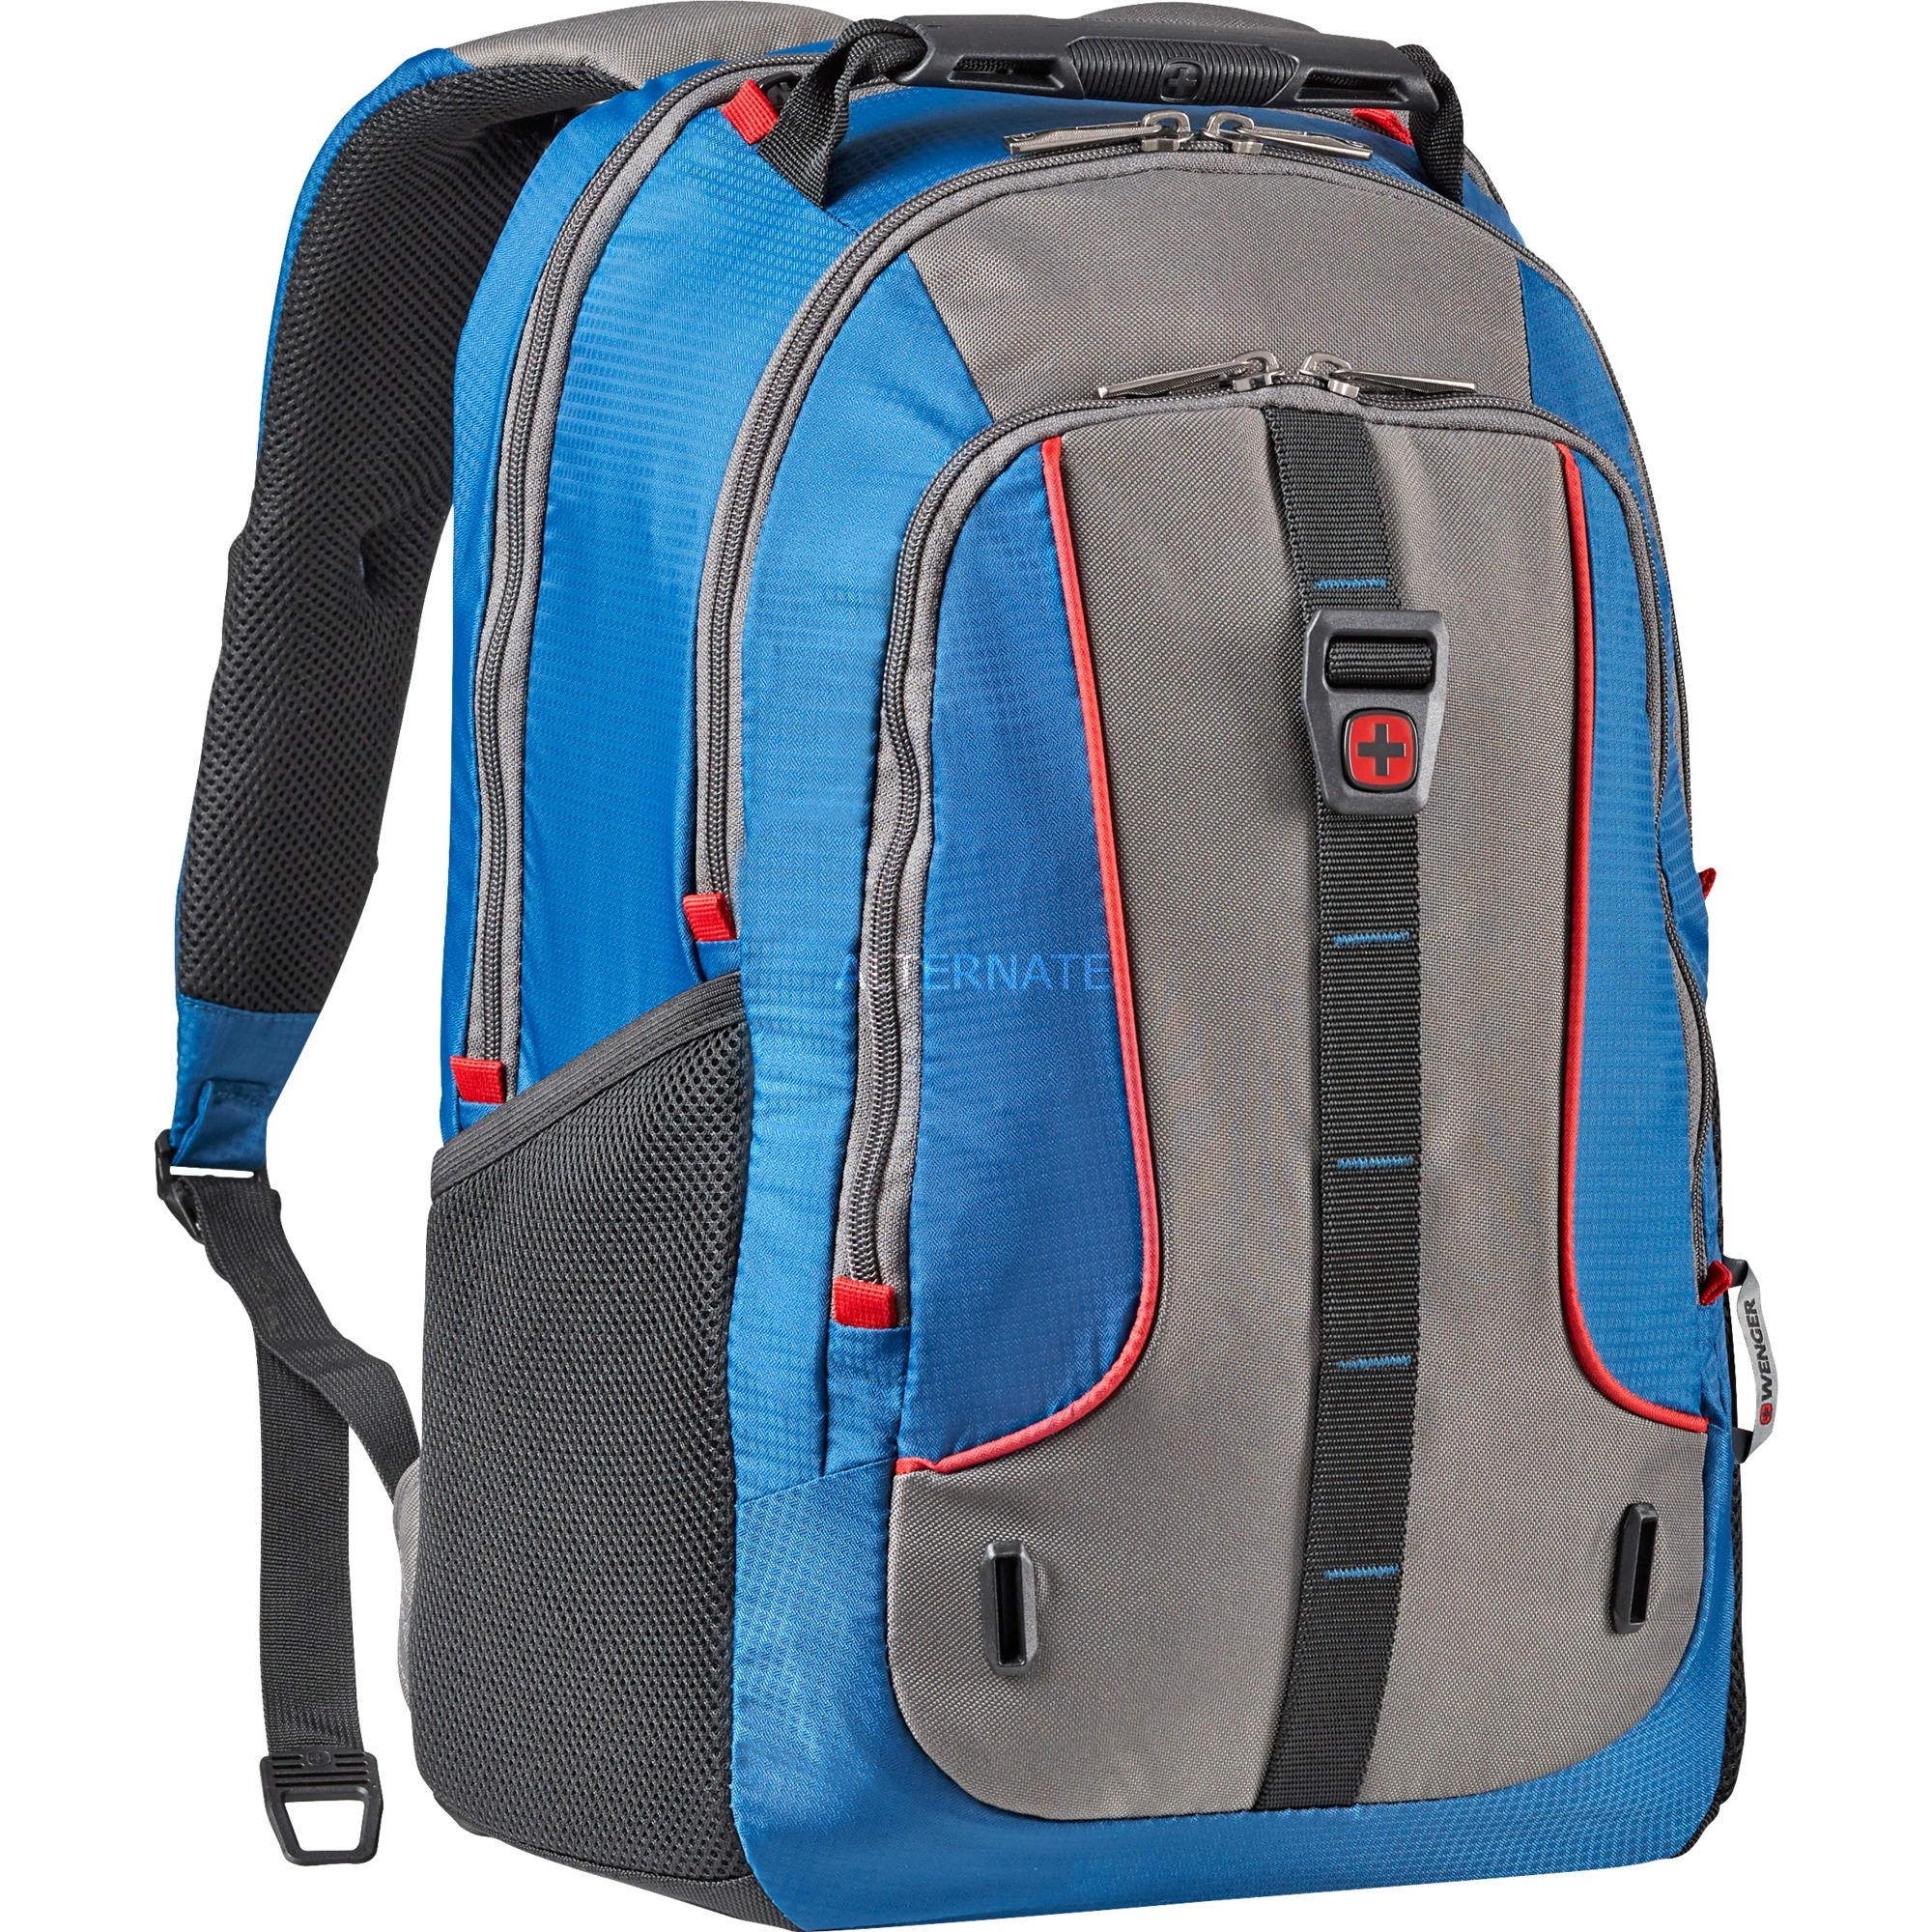 Enyo 16'' mochila Poliéster Azul, Gris